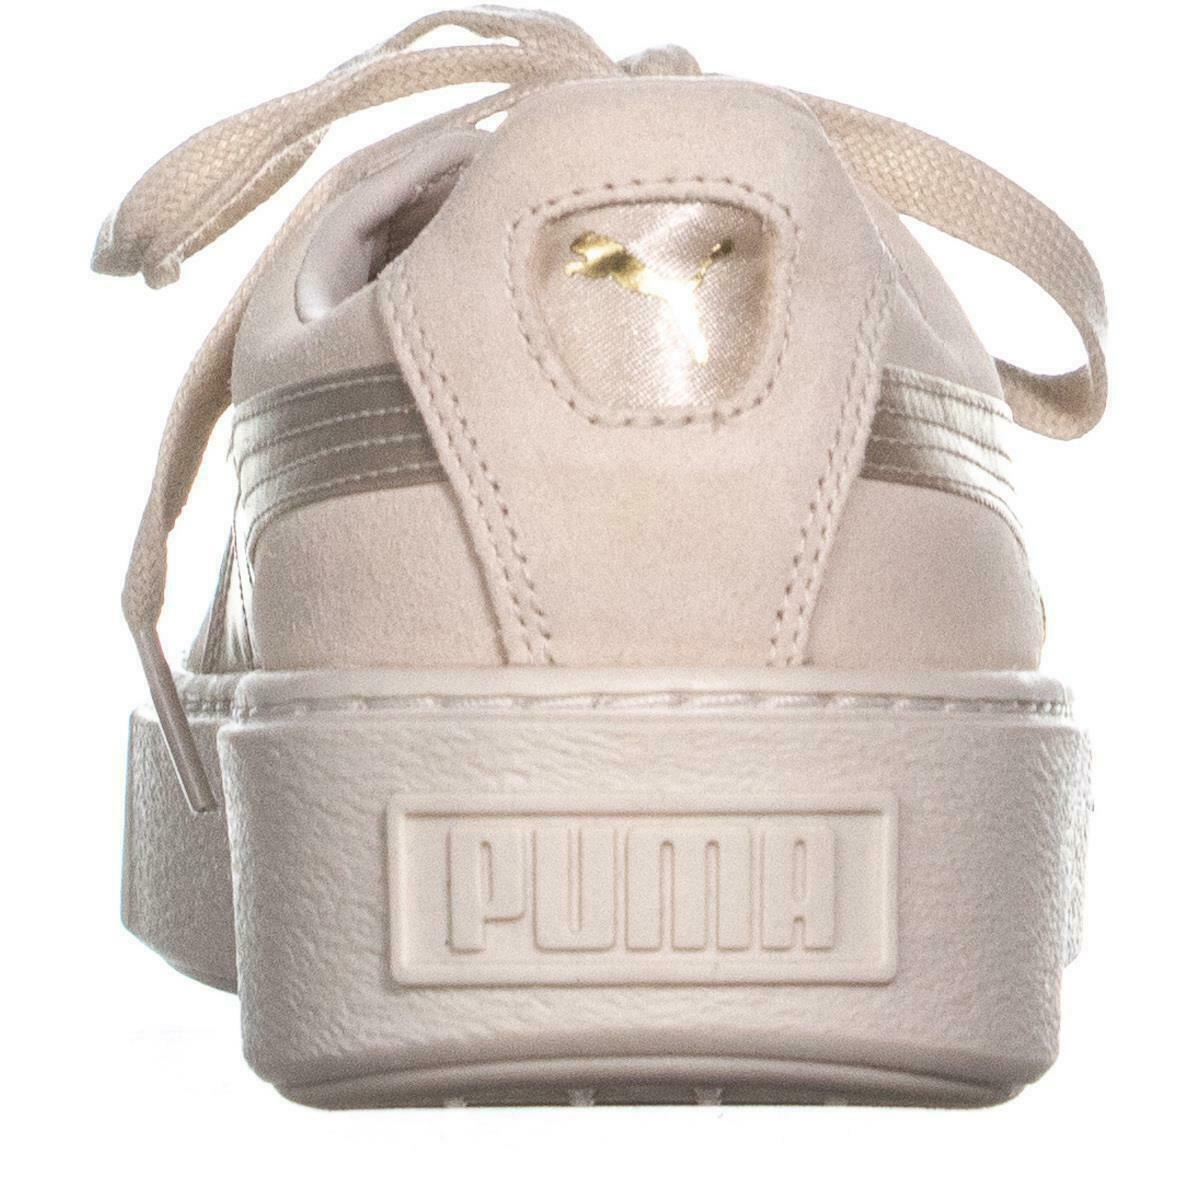 Puma Daim Plateforme Baskets à Lacets,Teinte Rose / Whipser Blanc / or,10 US /